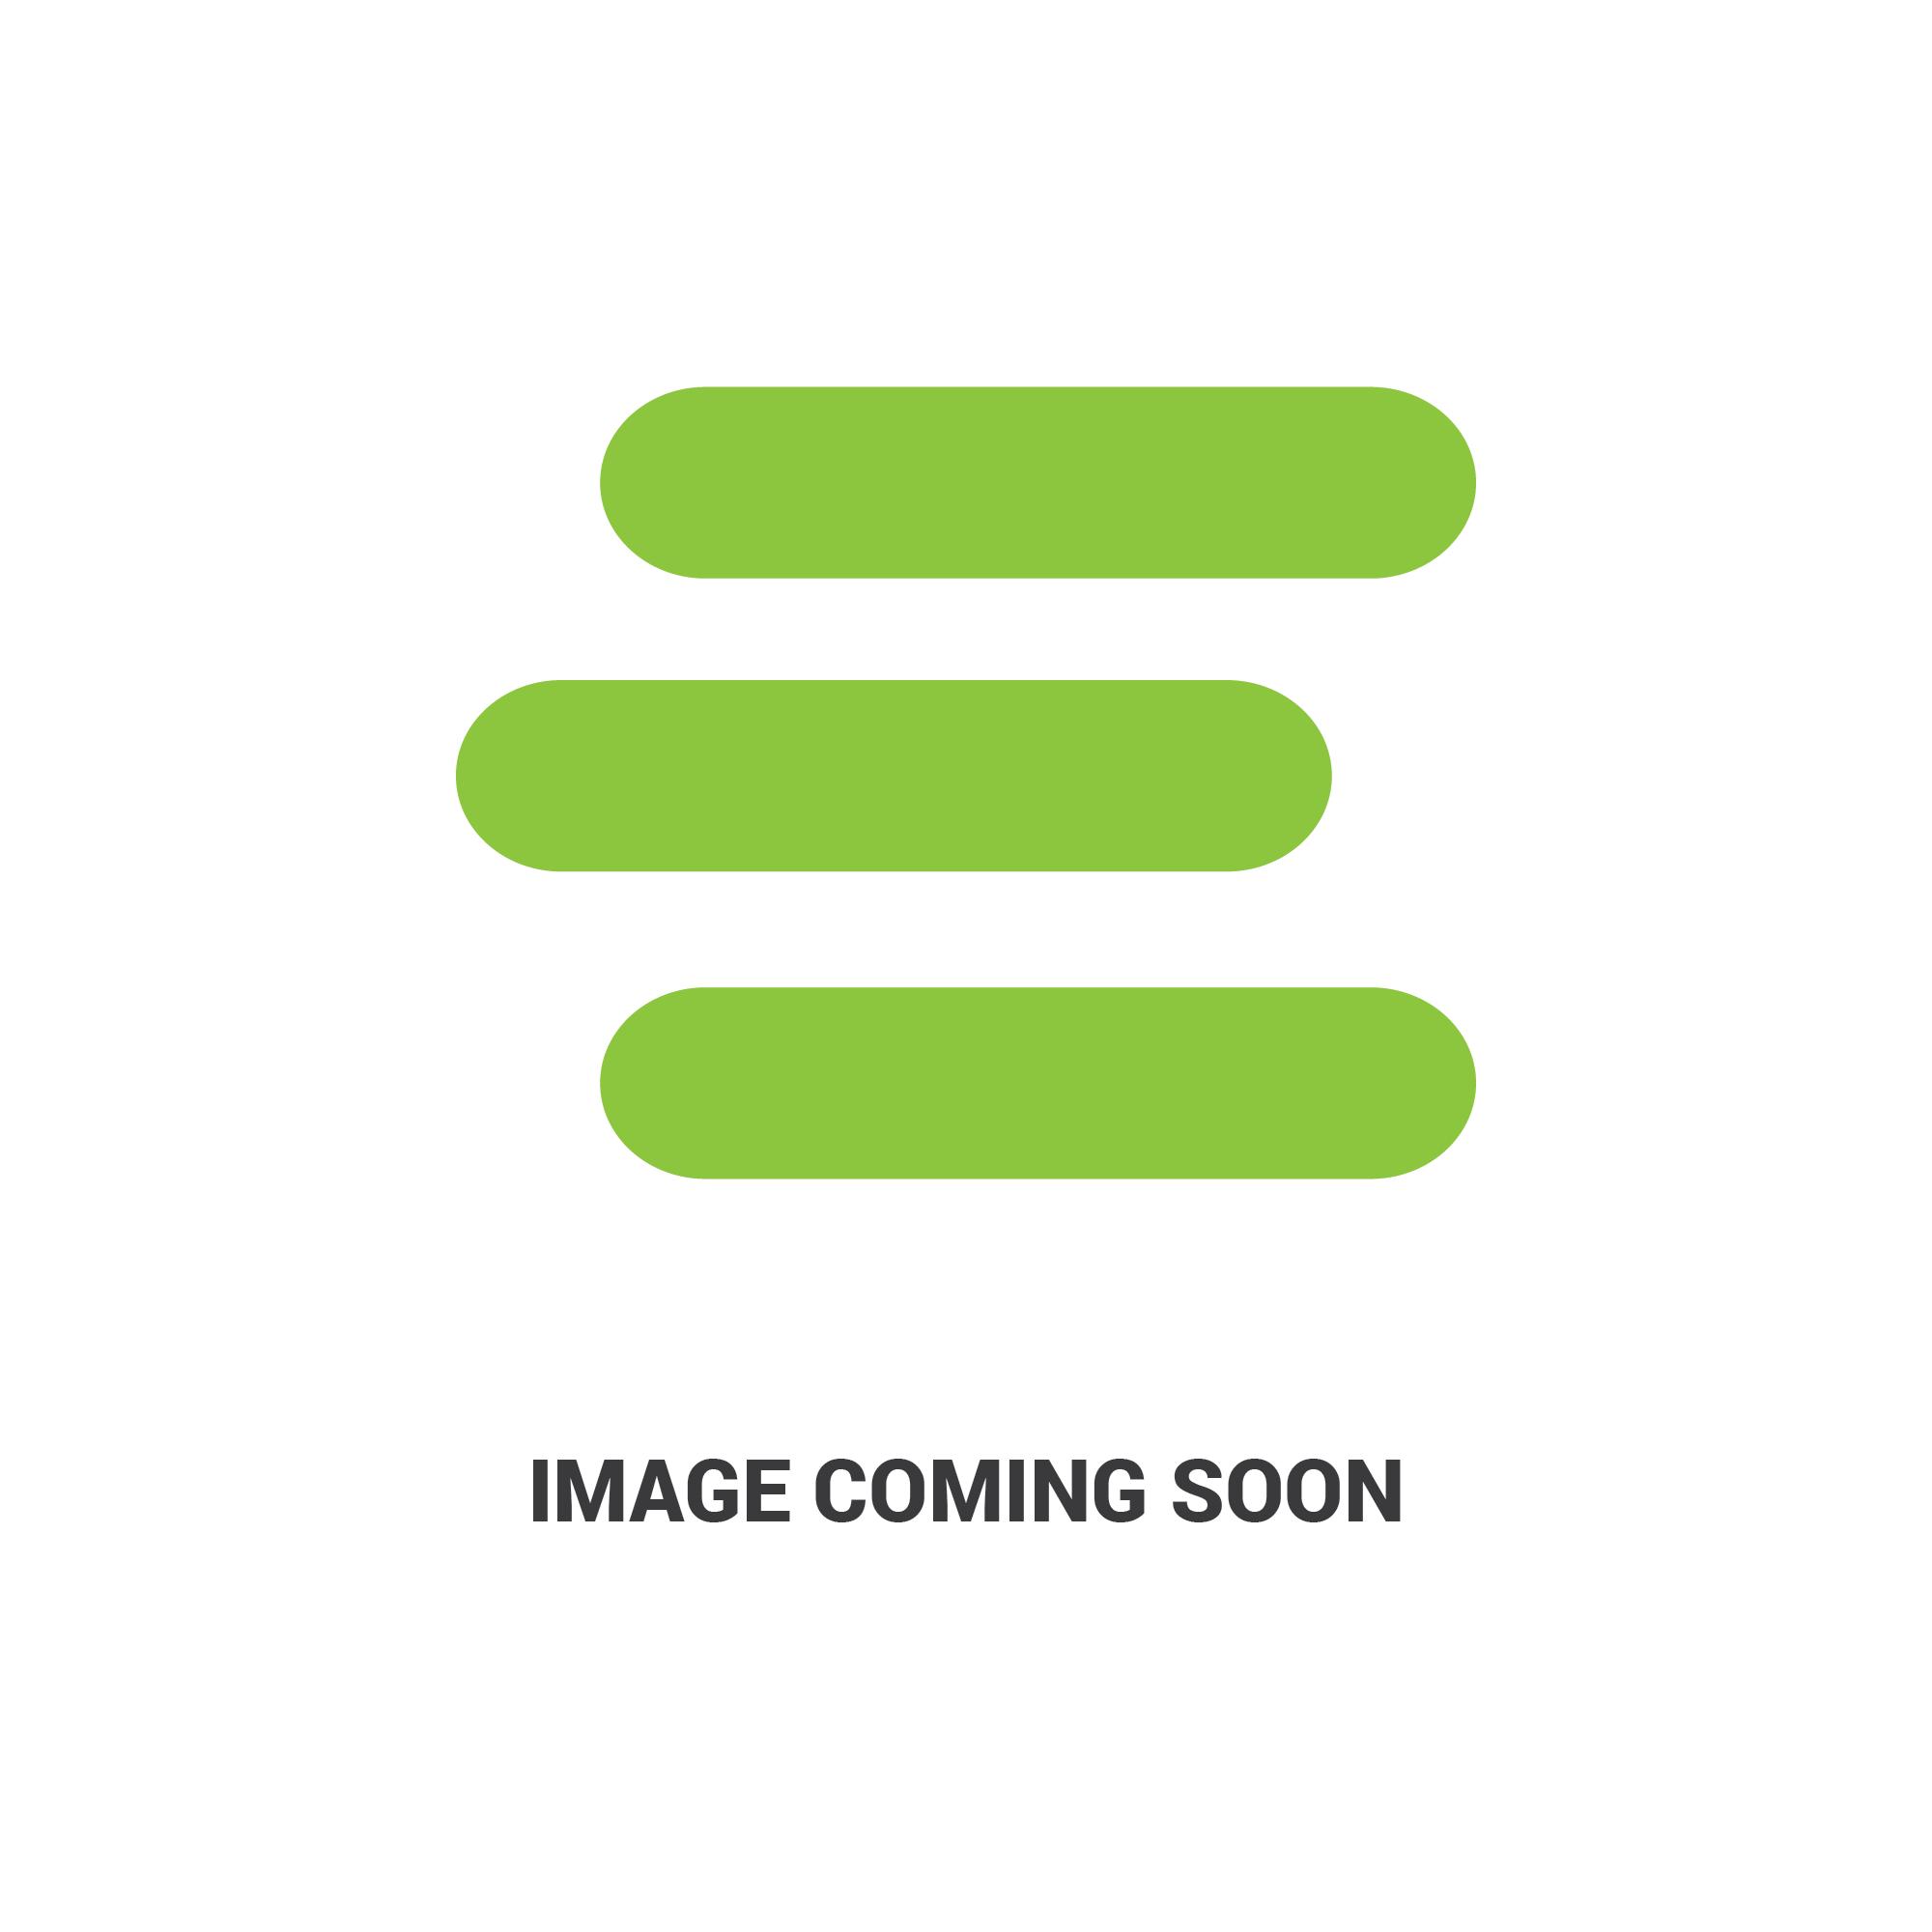 E-6672152edit 1.jpg